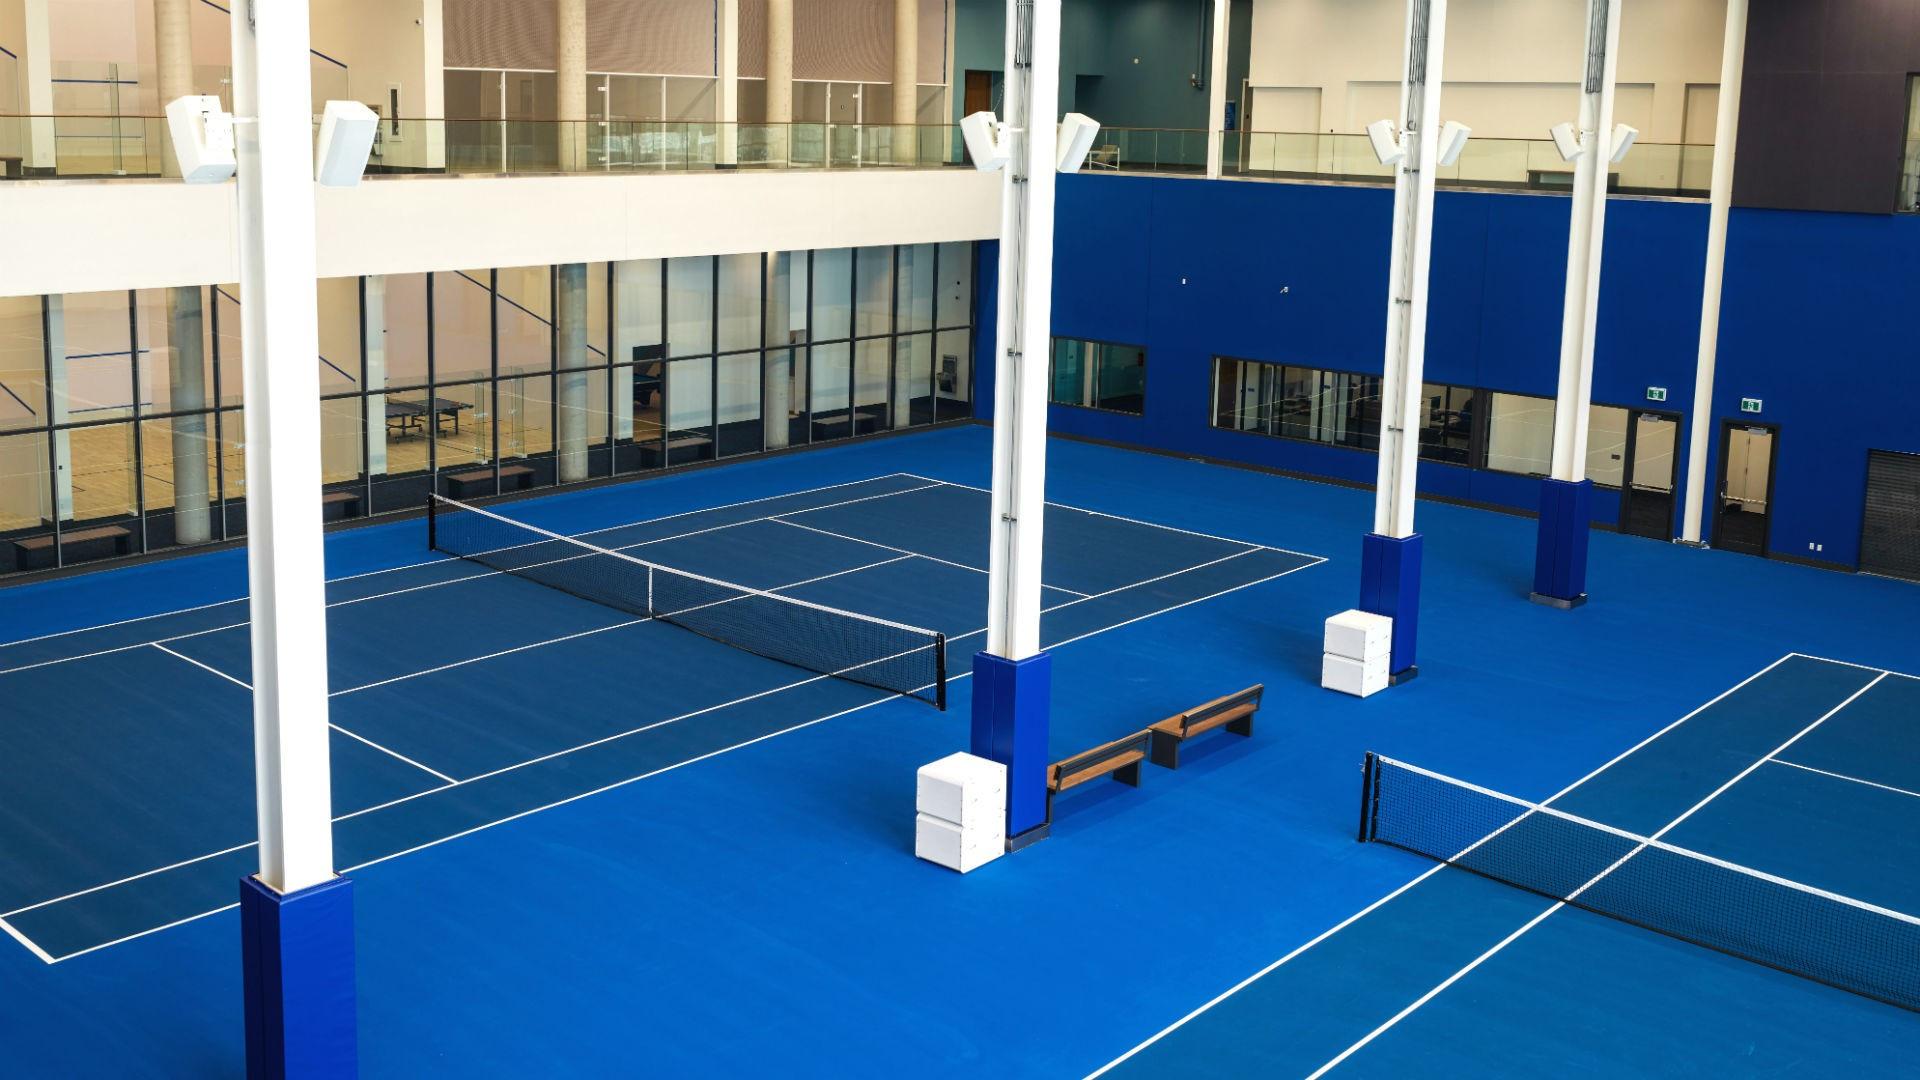 Hotel X Toronto staycation | Indoor tennis courts